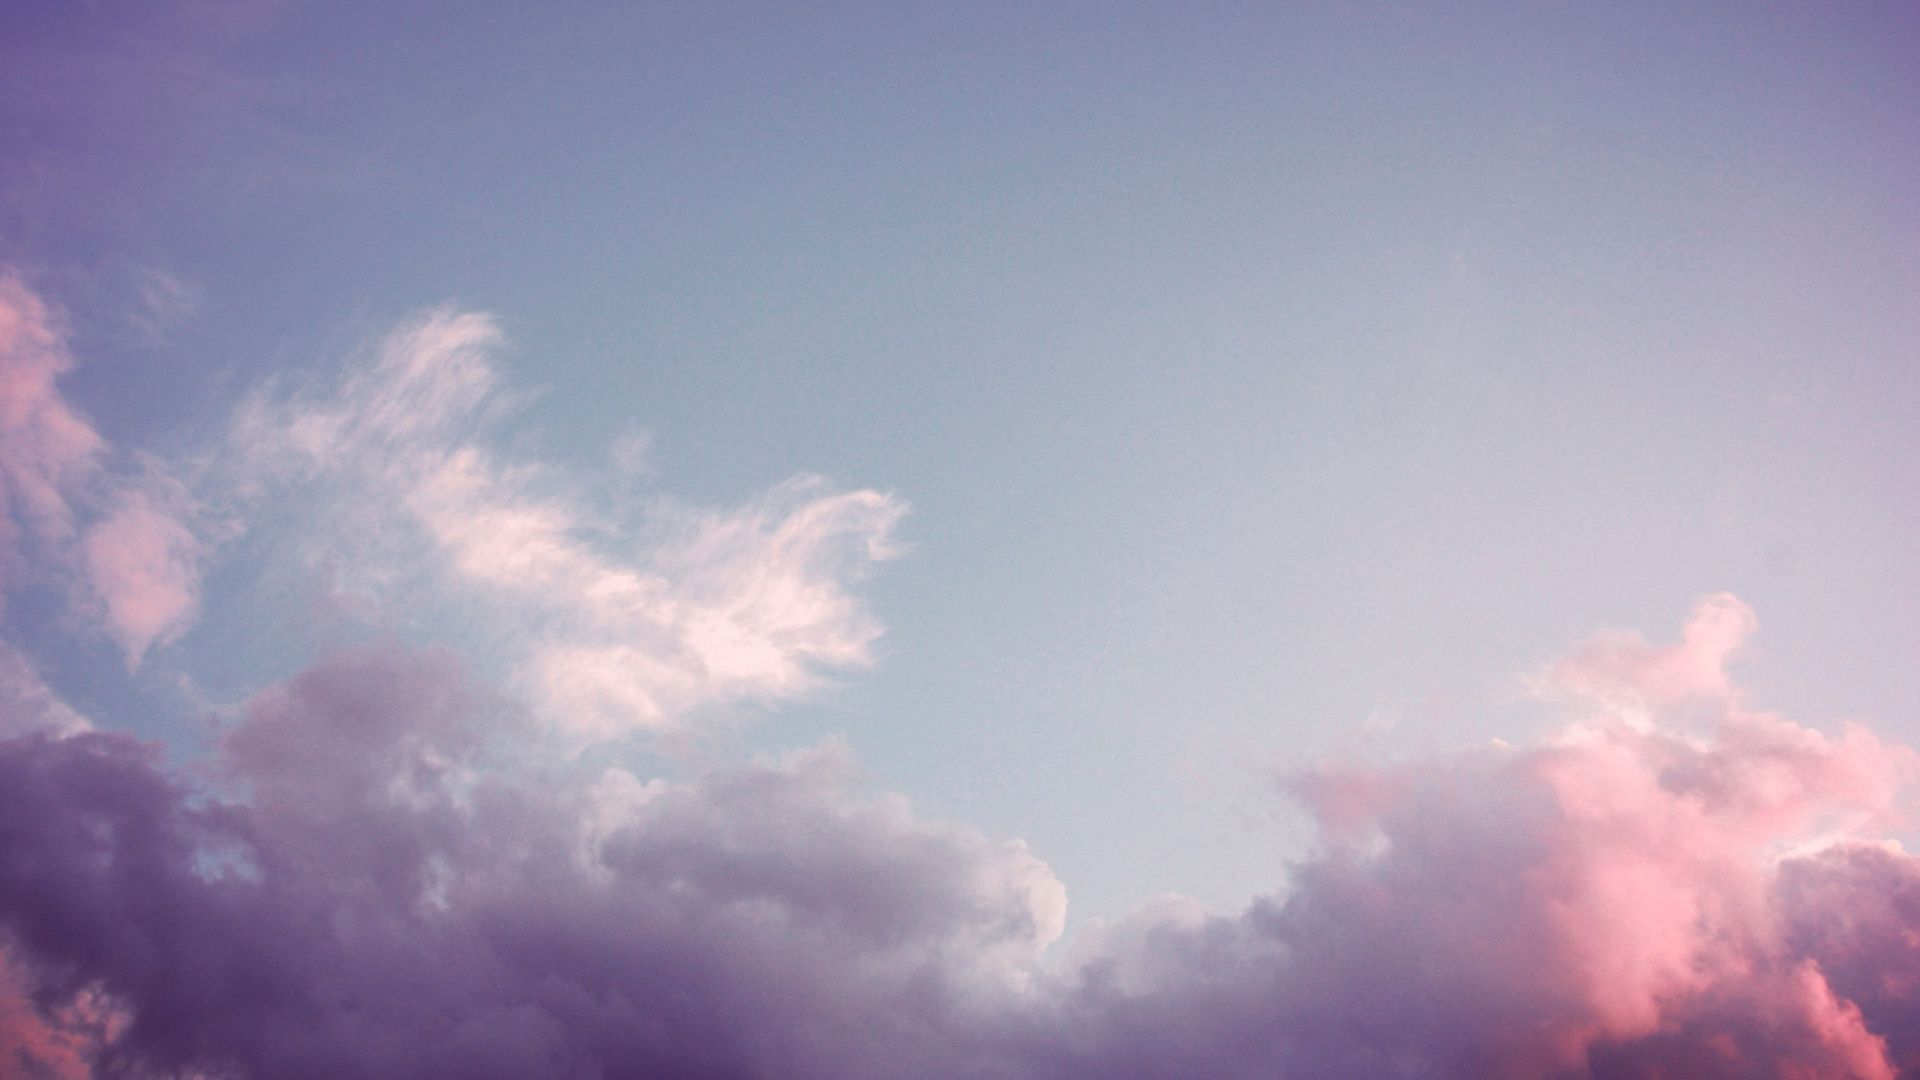 Sky Desktop Wallpaper Posted By Sarah Anderson